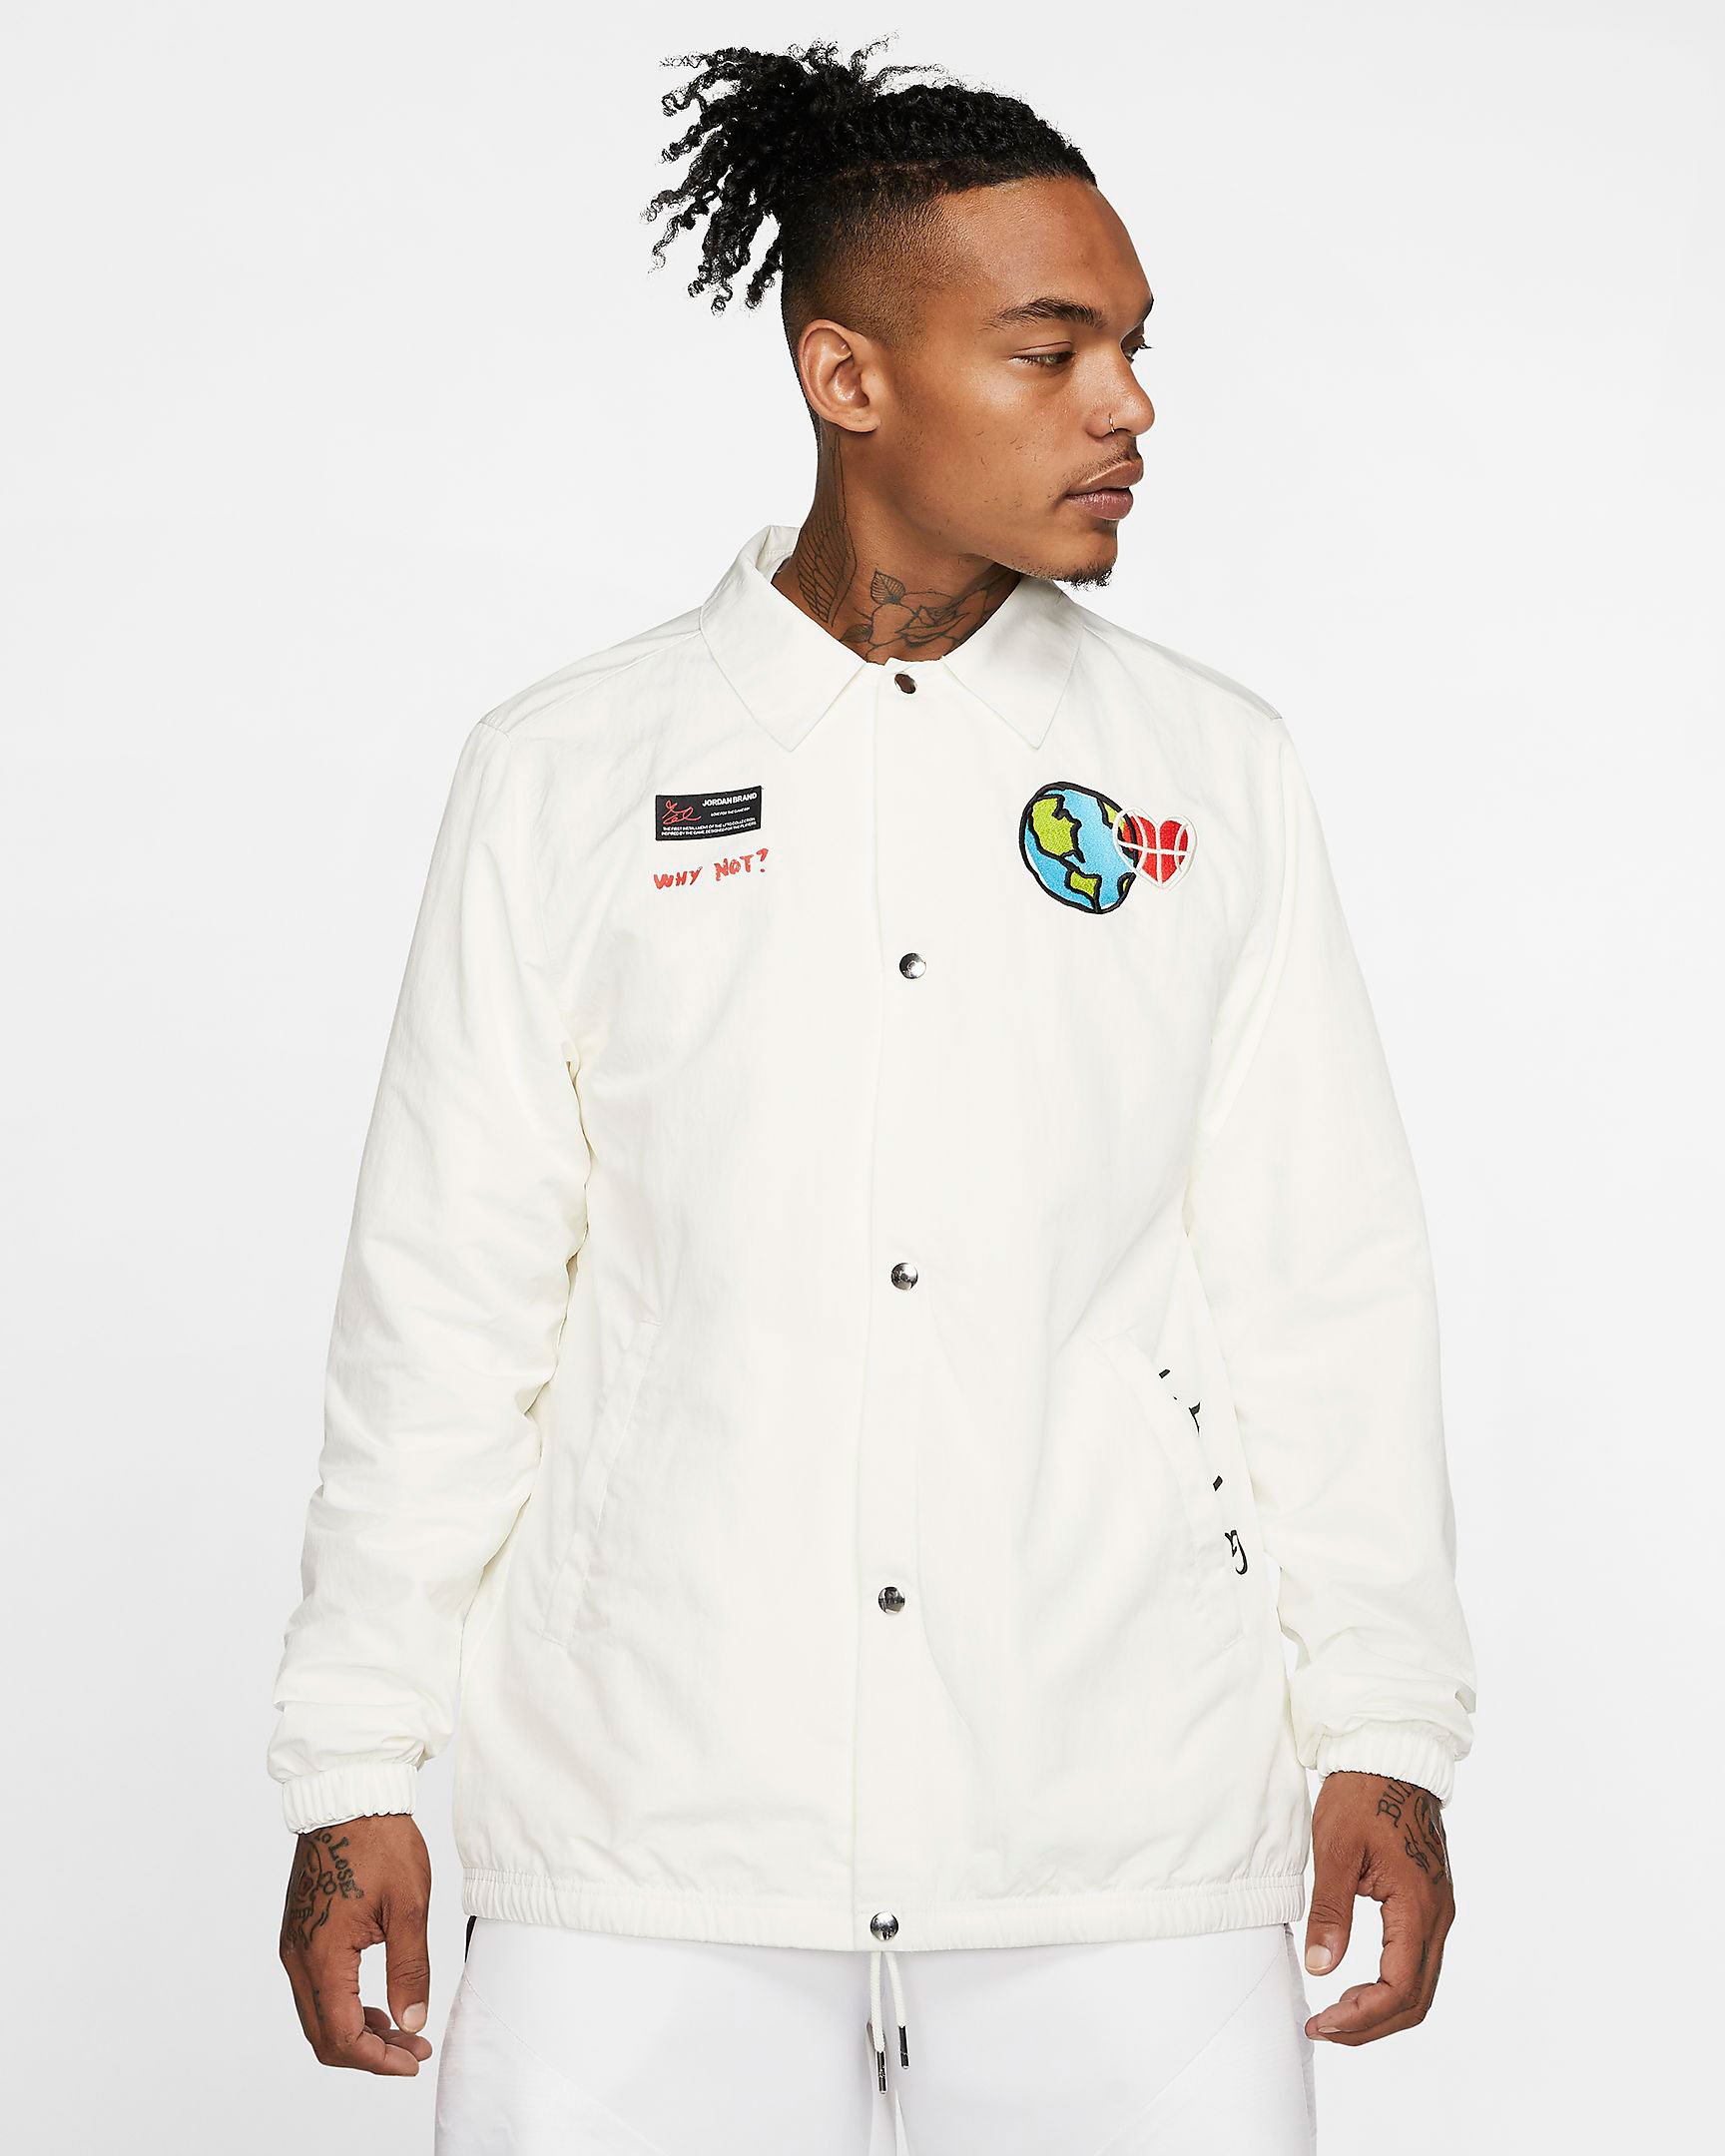 jordan-westbrook-why-not-zer03-jacket-white-1